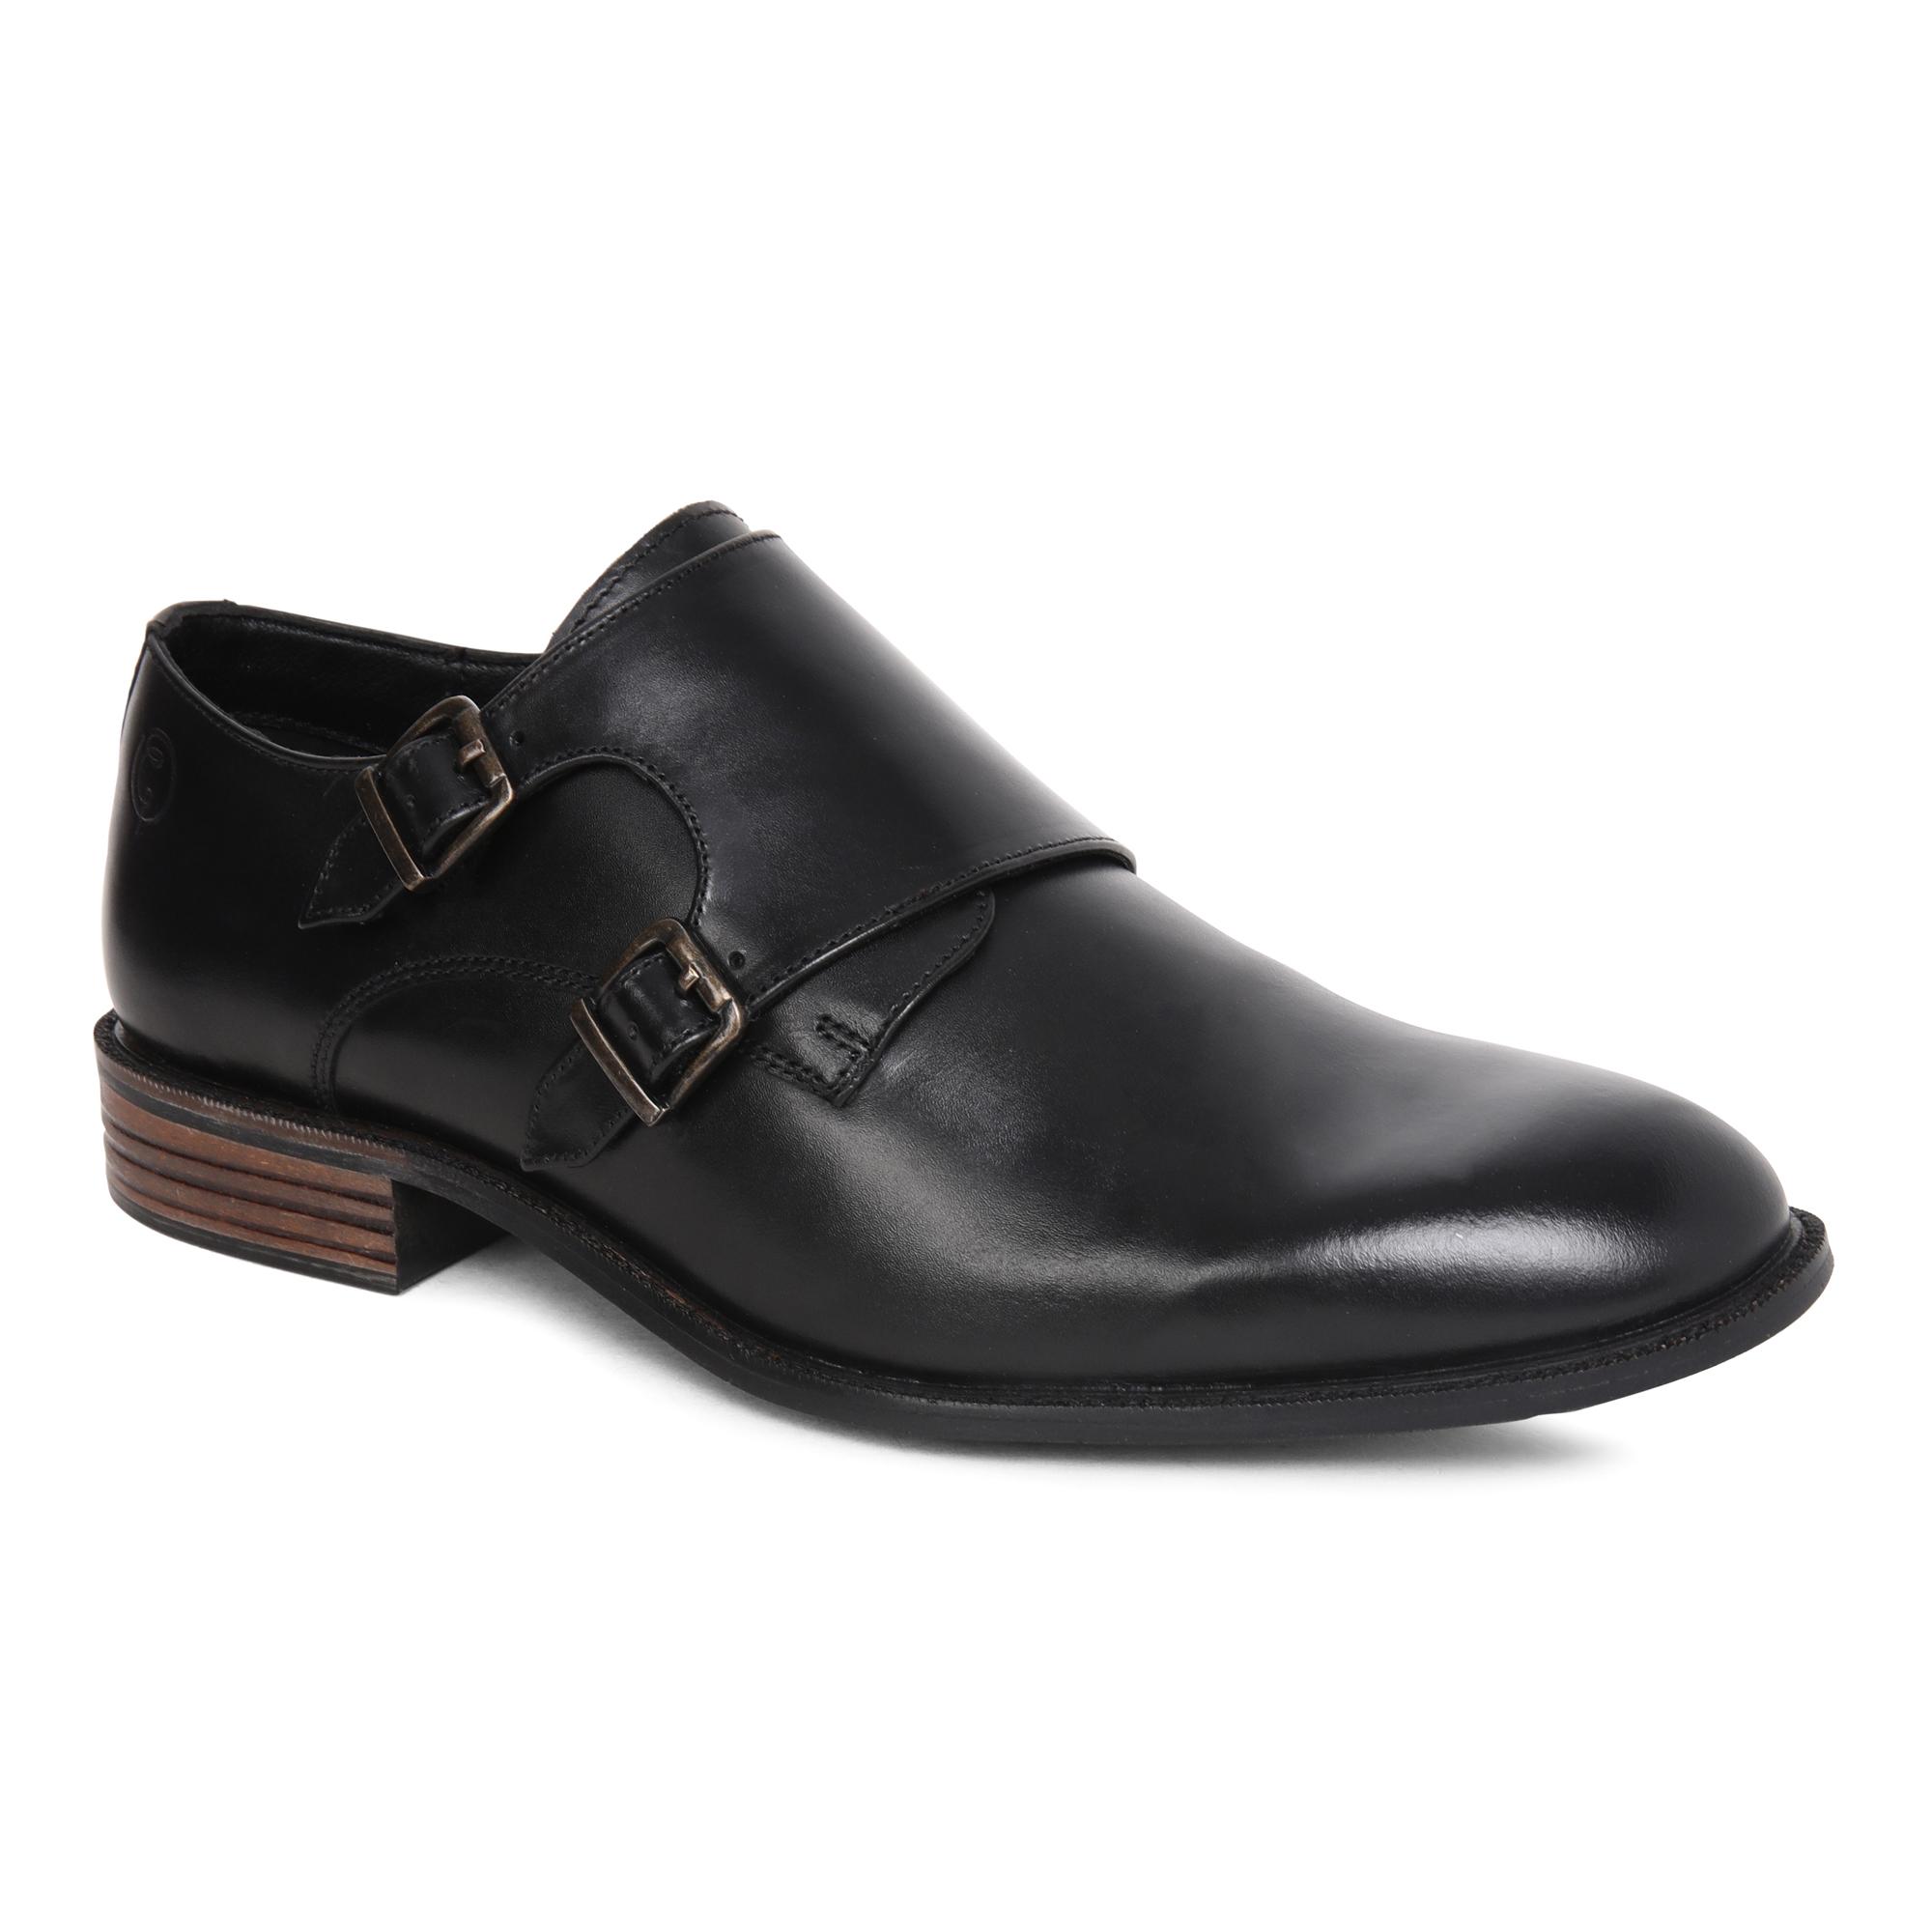 Carmicci | Carmicci Black Lifestyle Breathable Formal Shoes for Men - A1CR911A02A031